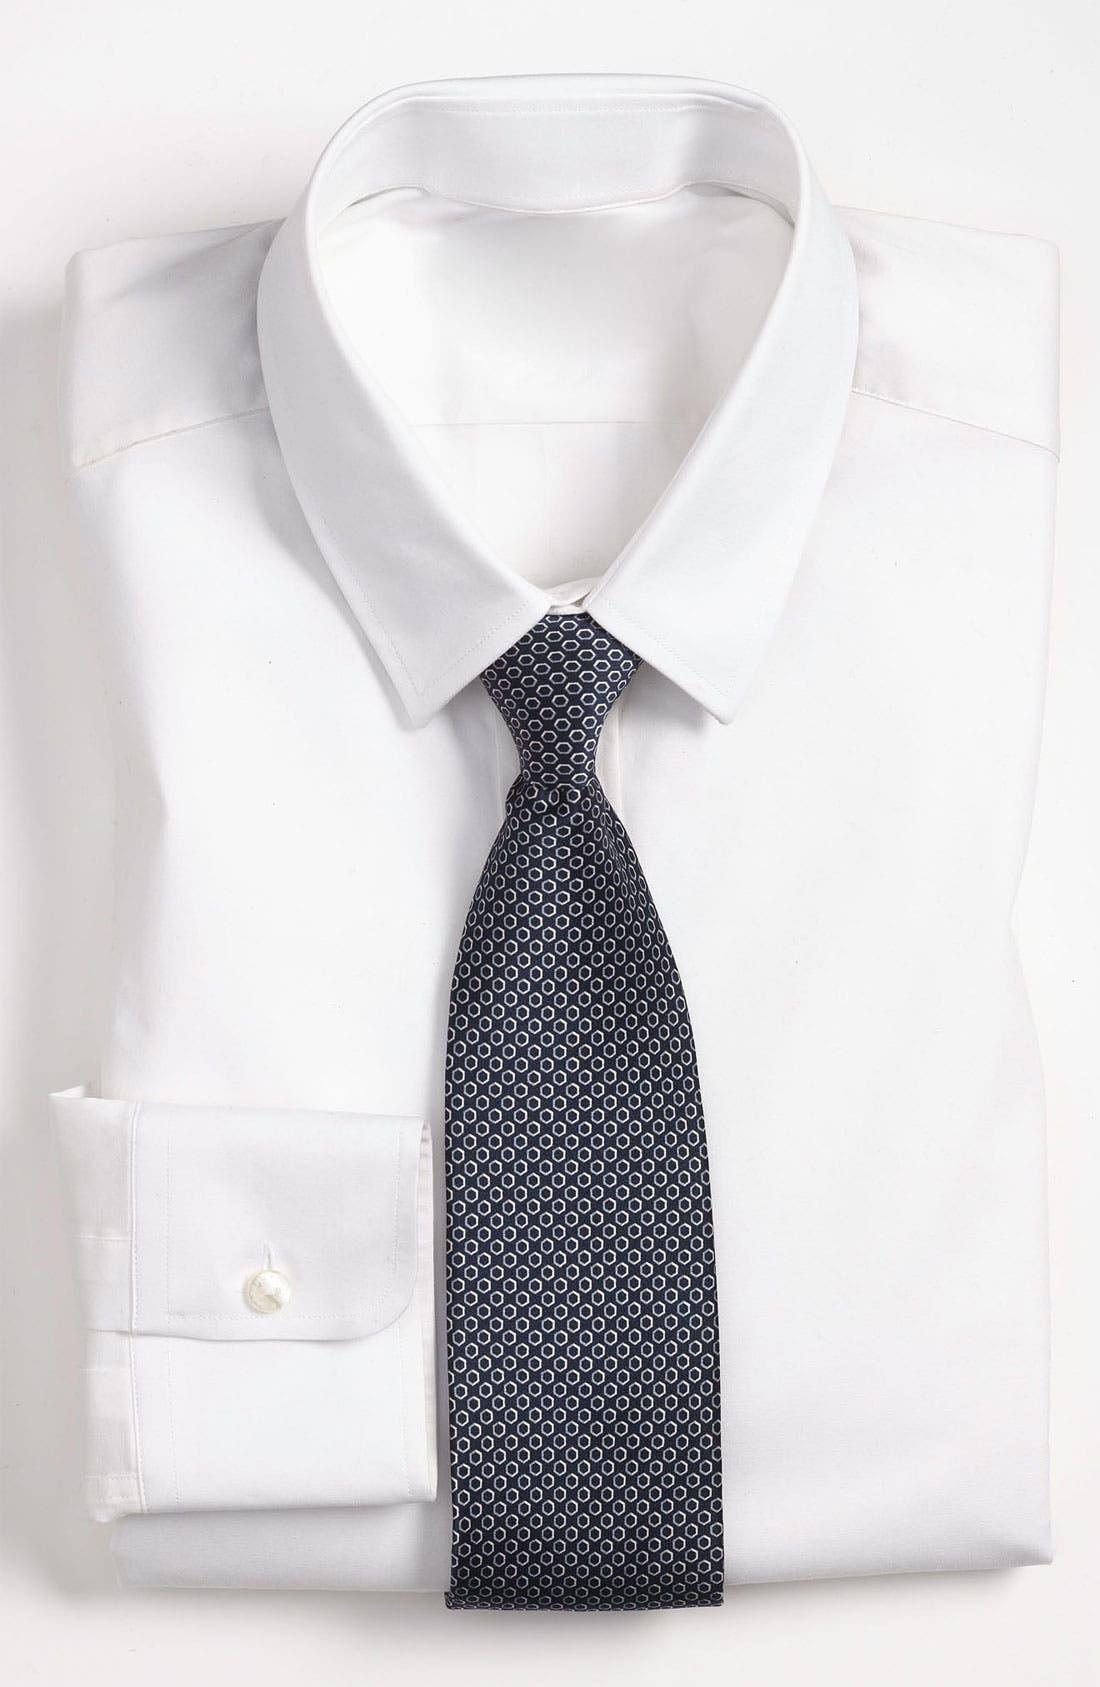 Main Image - Yves Saint Laurent Hexagon Pattern Woven Silk Tie